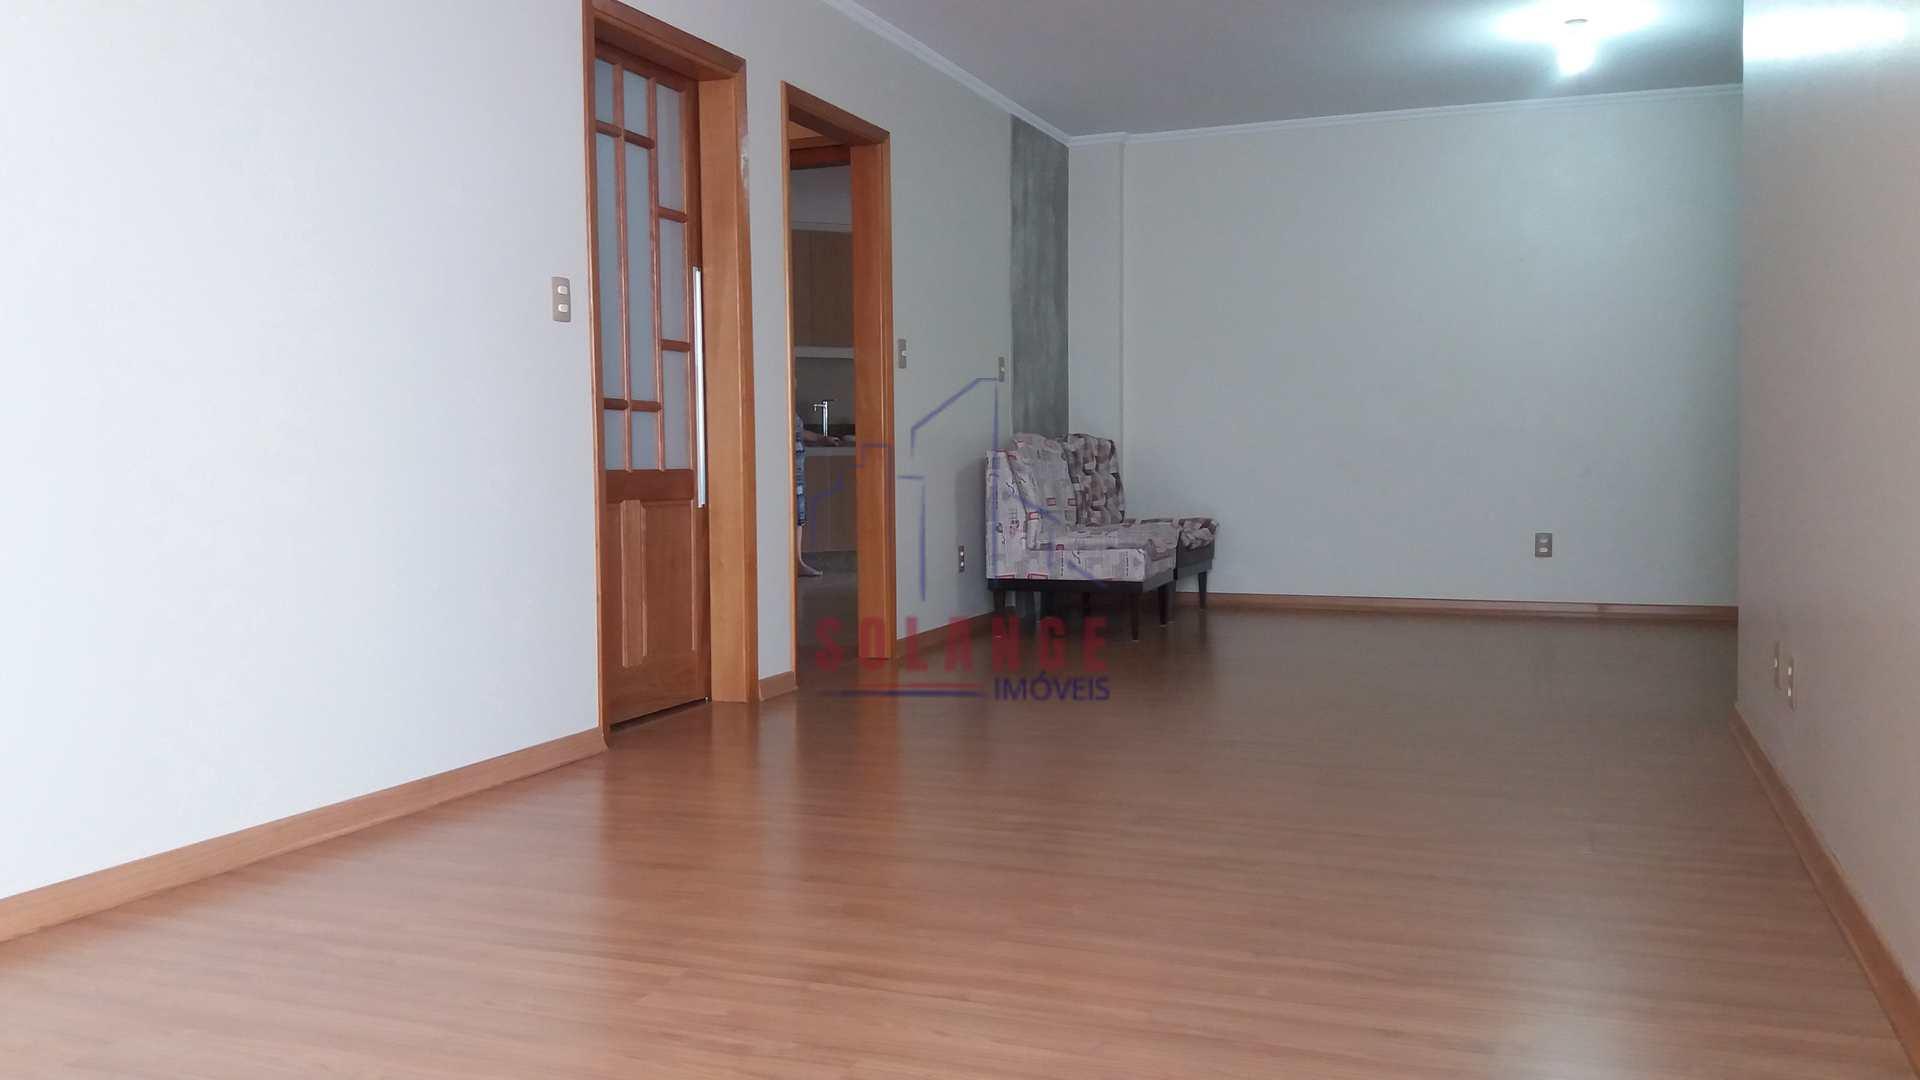 Apartamento com 3 dorms, Centro, Amparo - R$ 750 mil, Cod: 2204